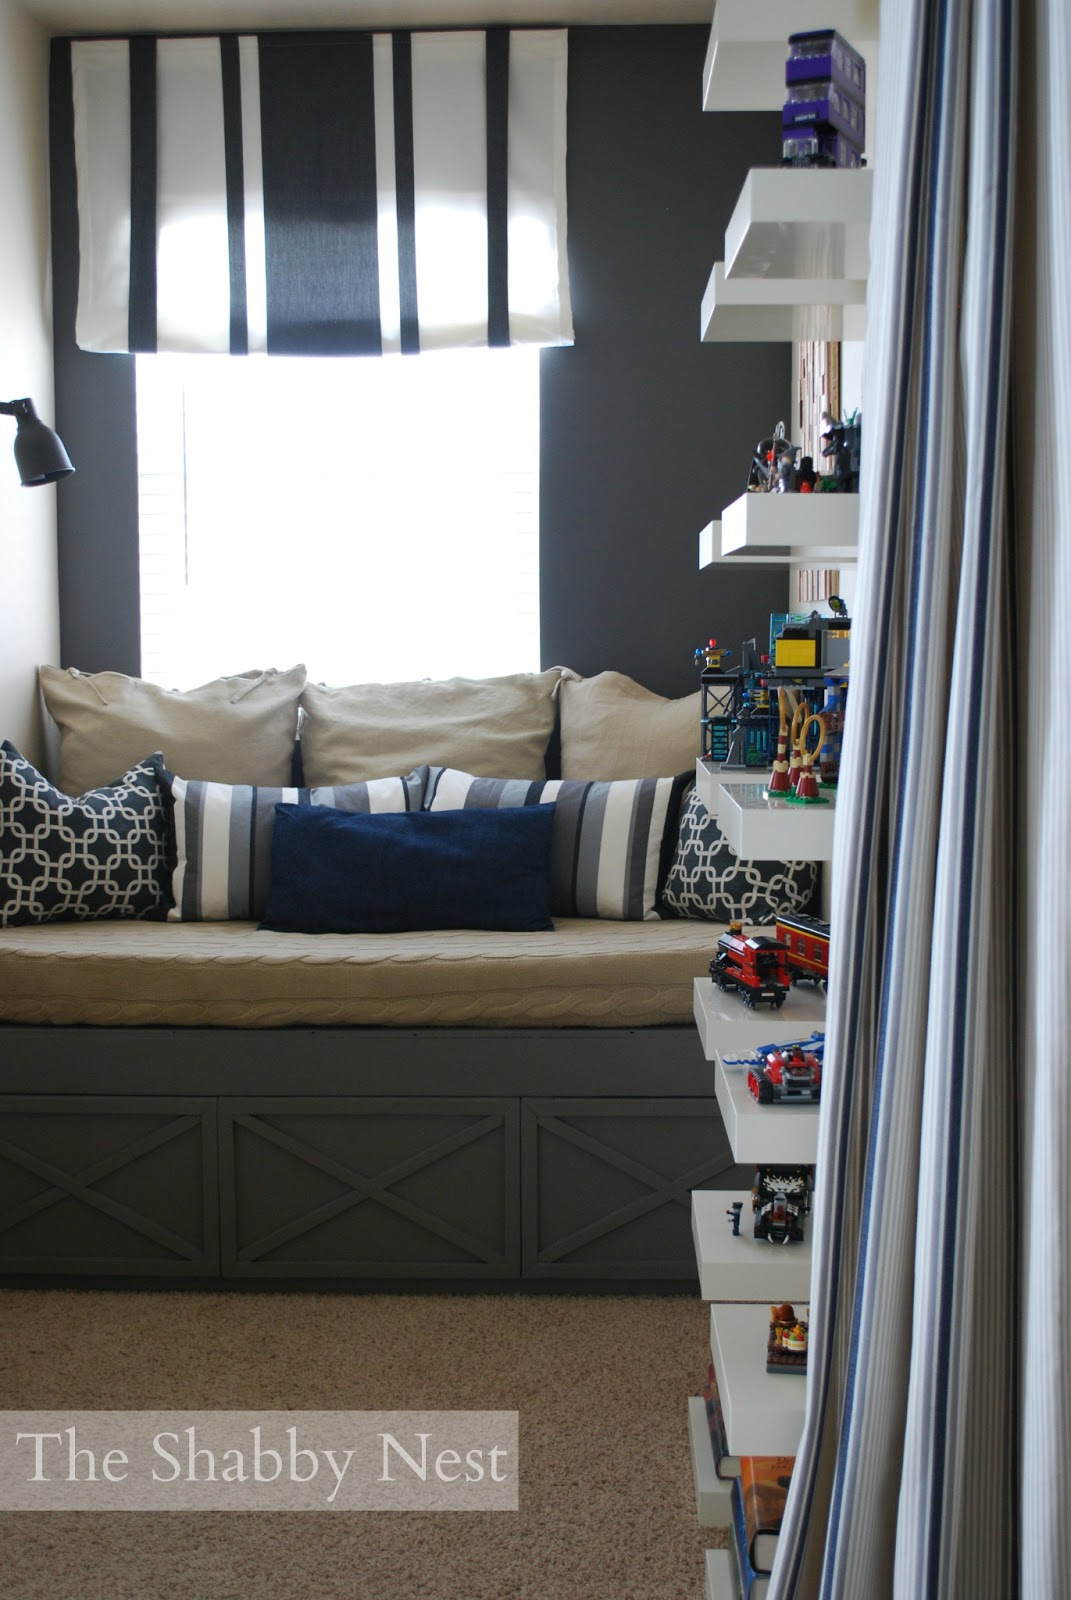 Loft Bedroom Privacy The Shabby Nest Loft Bedroom Reveal